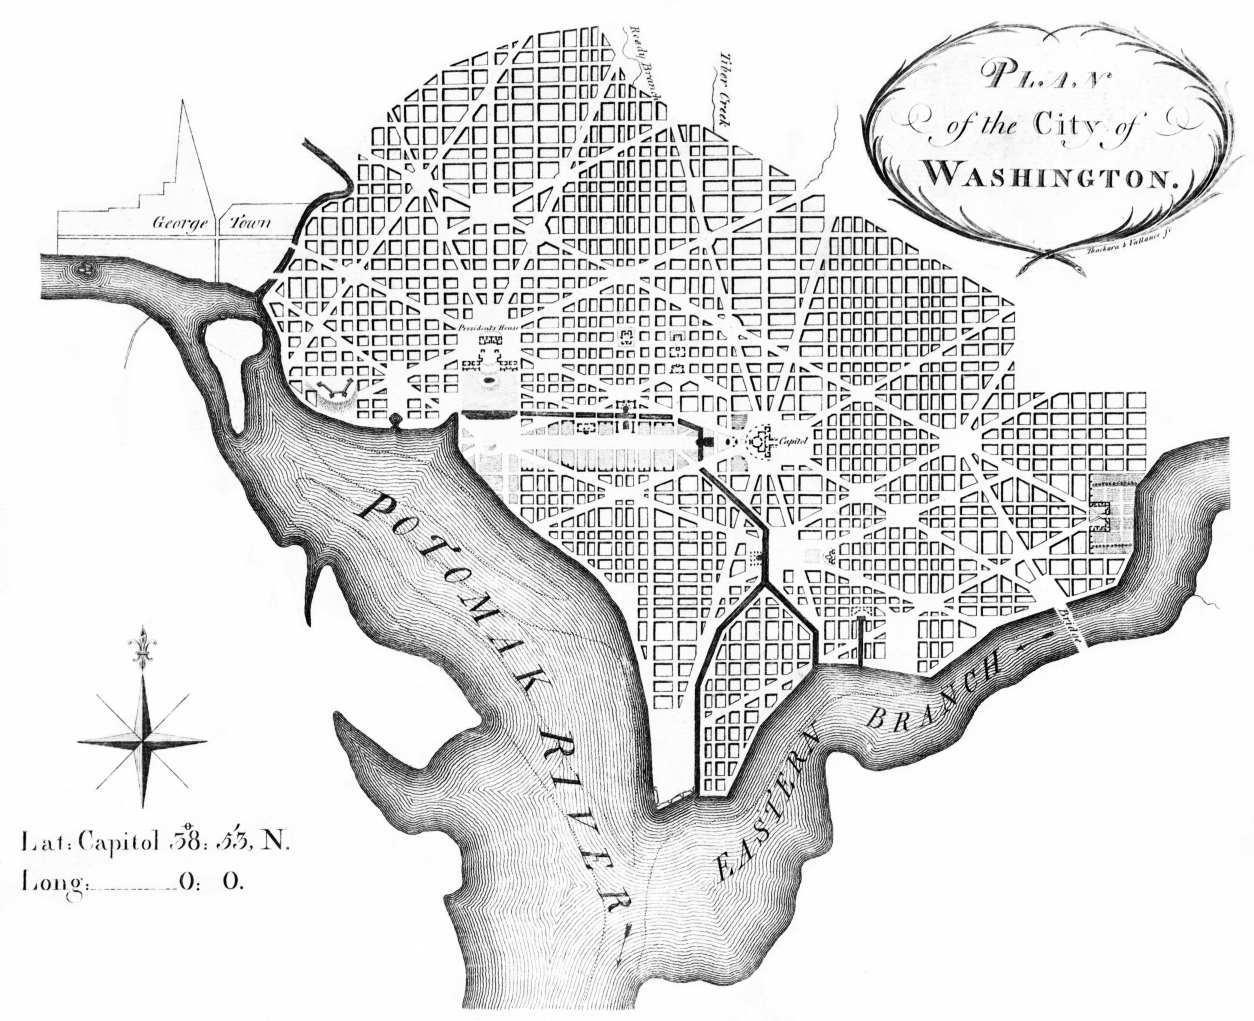 L'Enfant's original plan for Washington DC